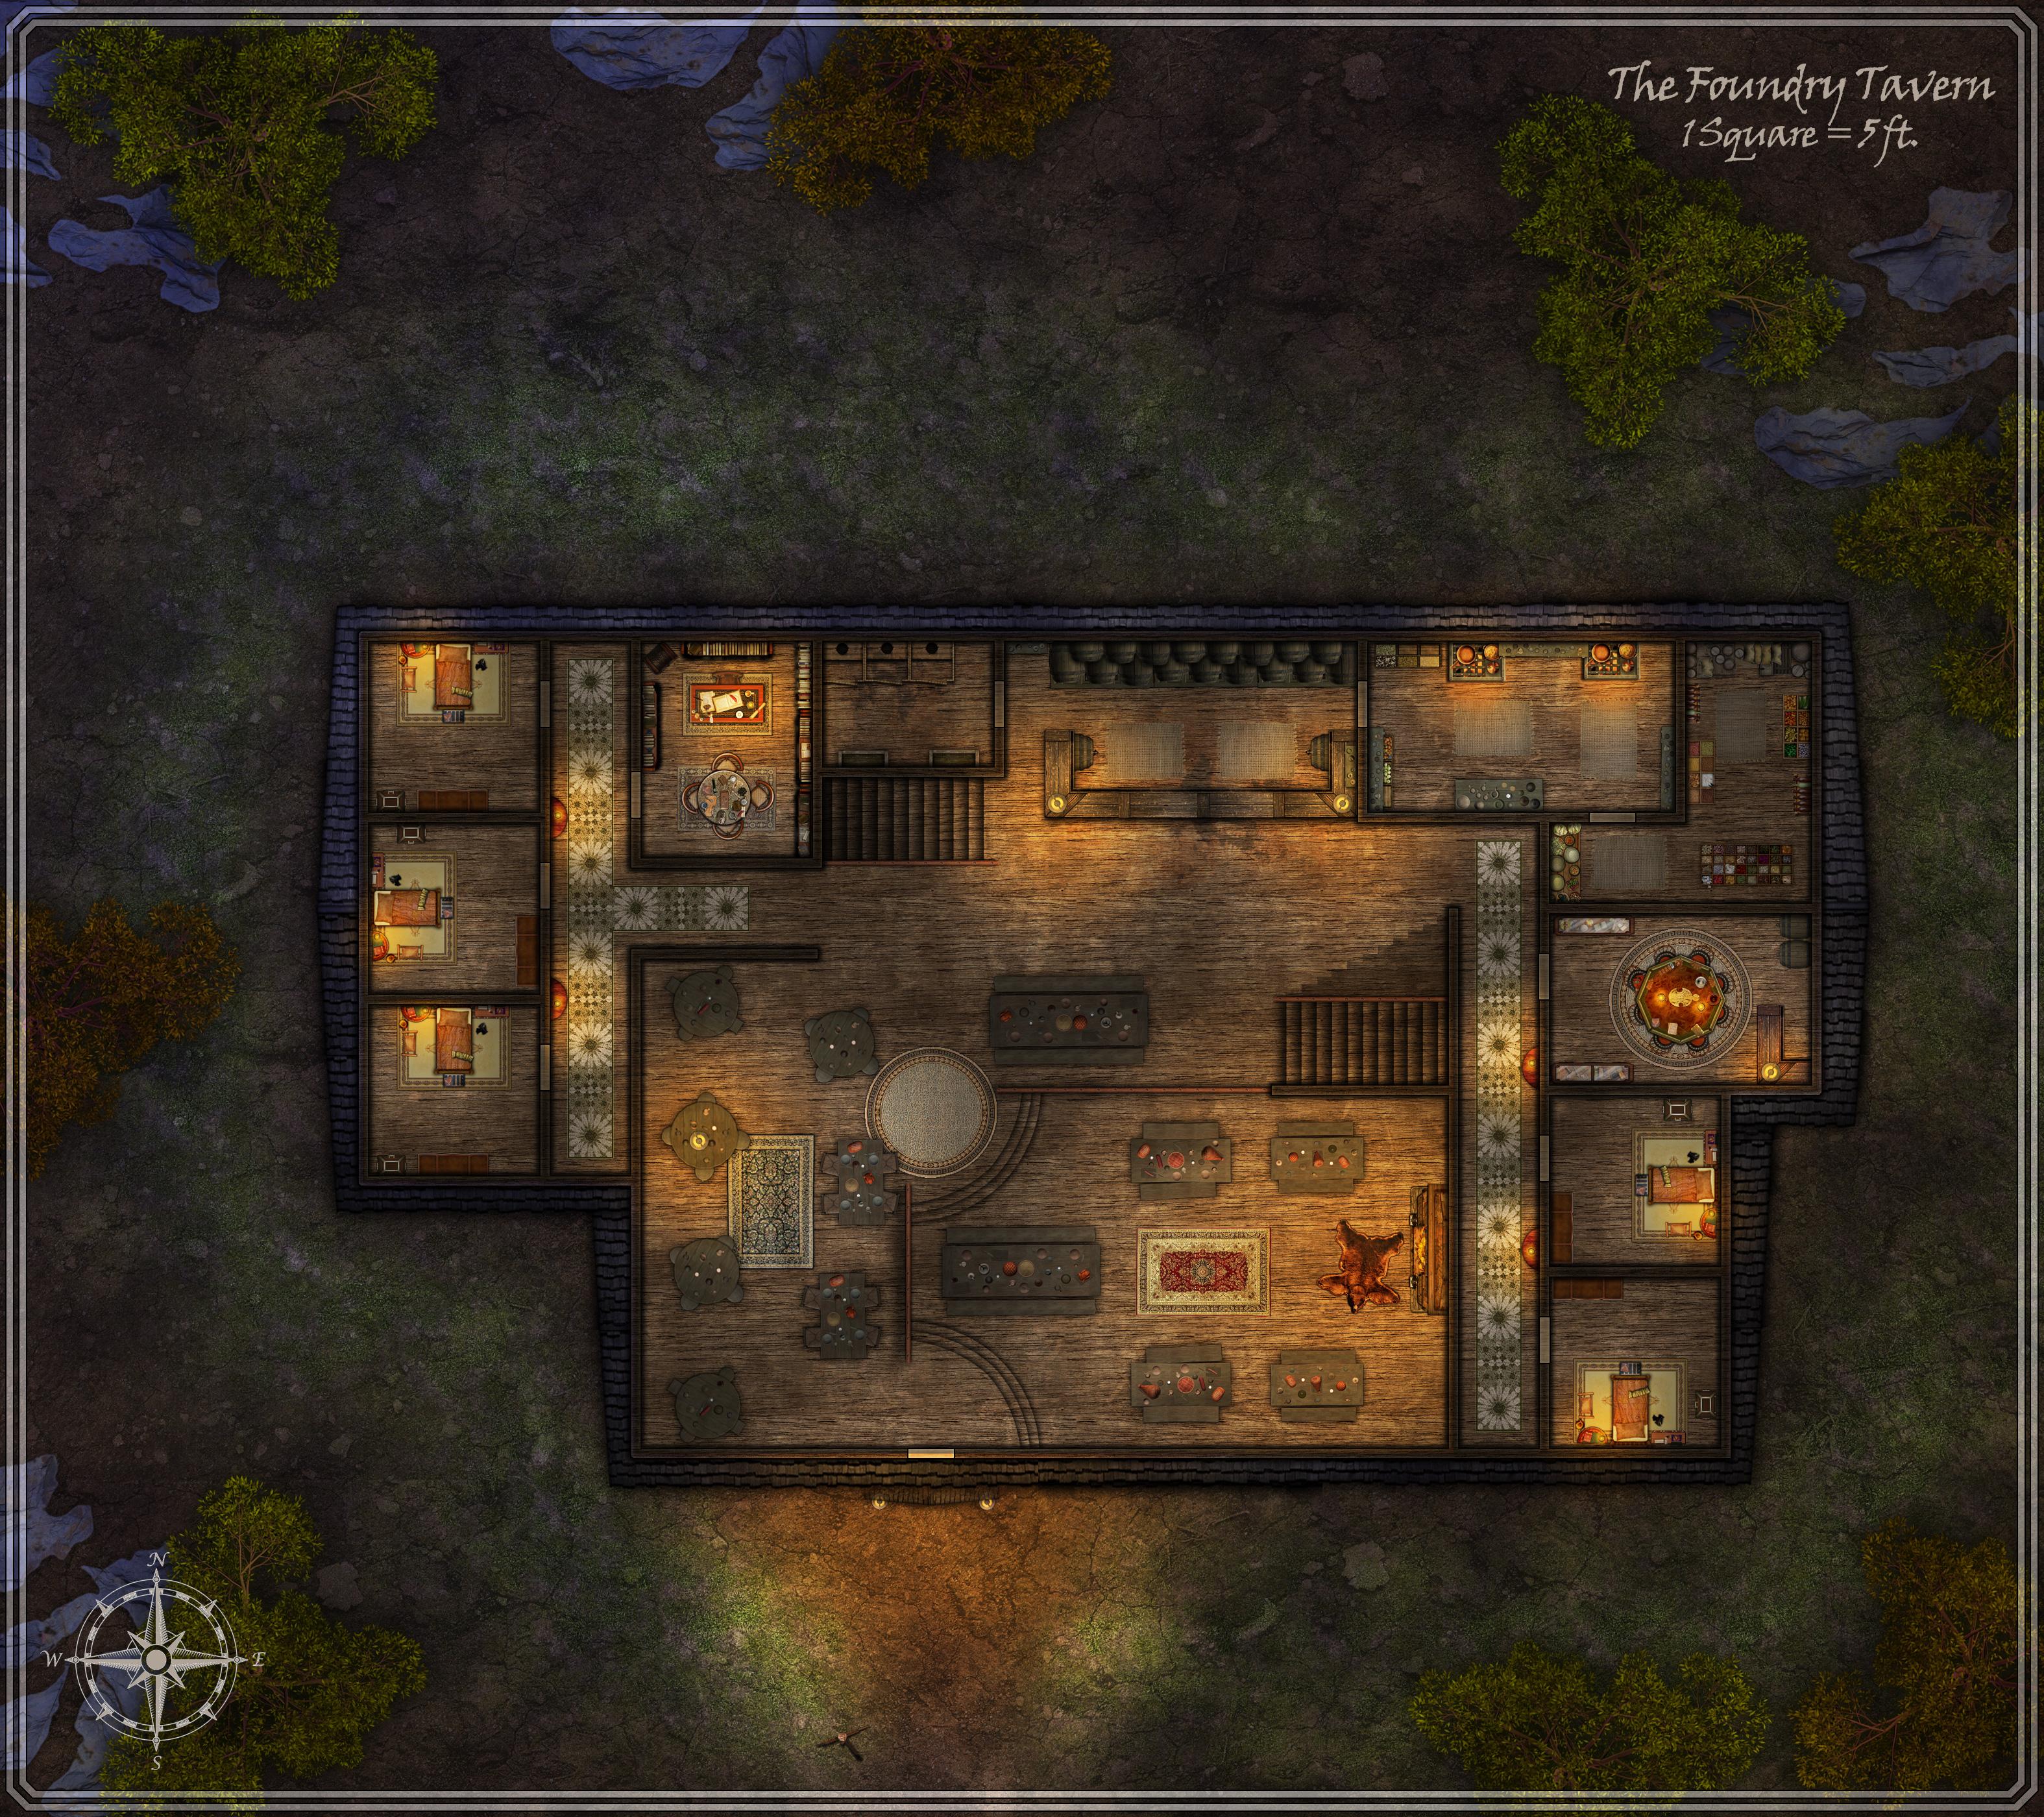 Foundry Tavern at Night by FoundryAtropos